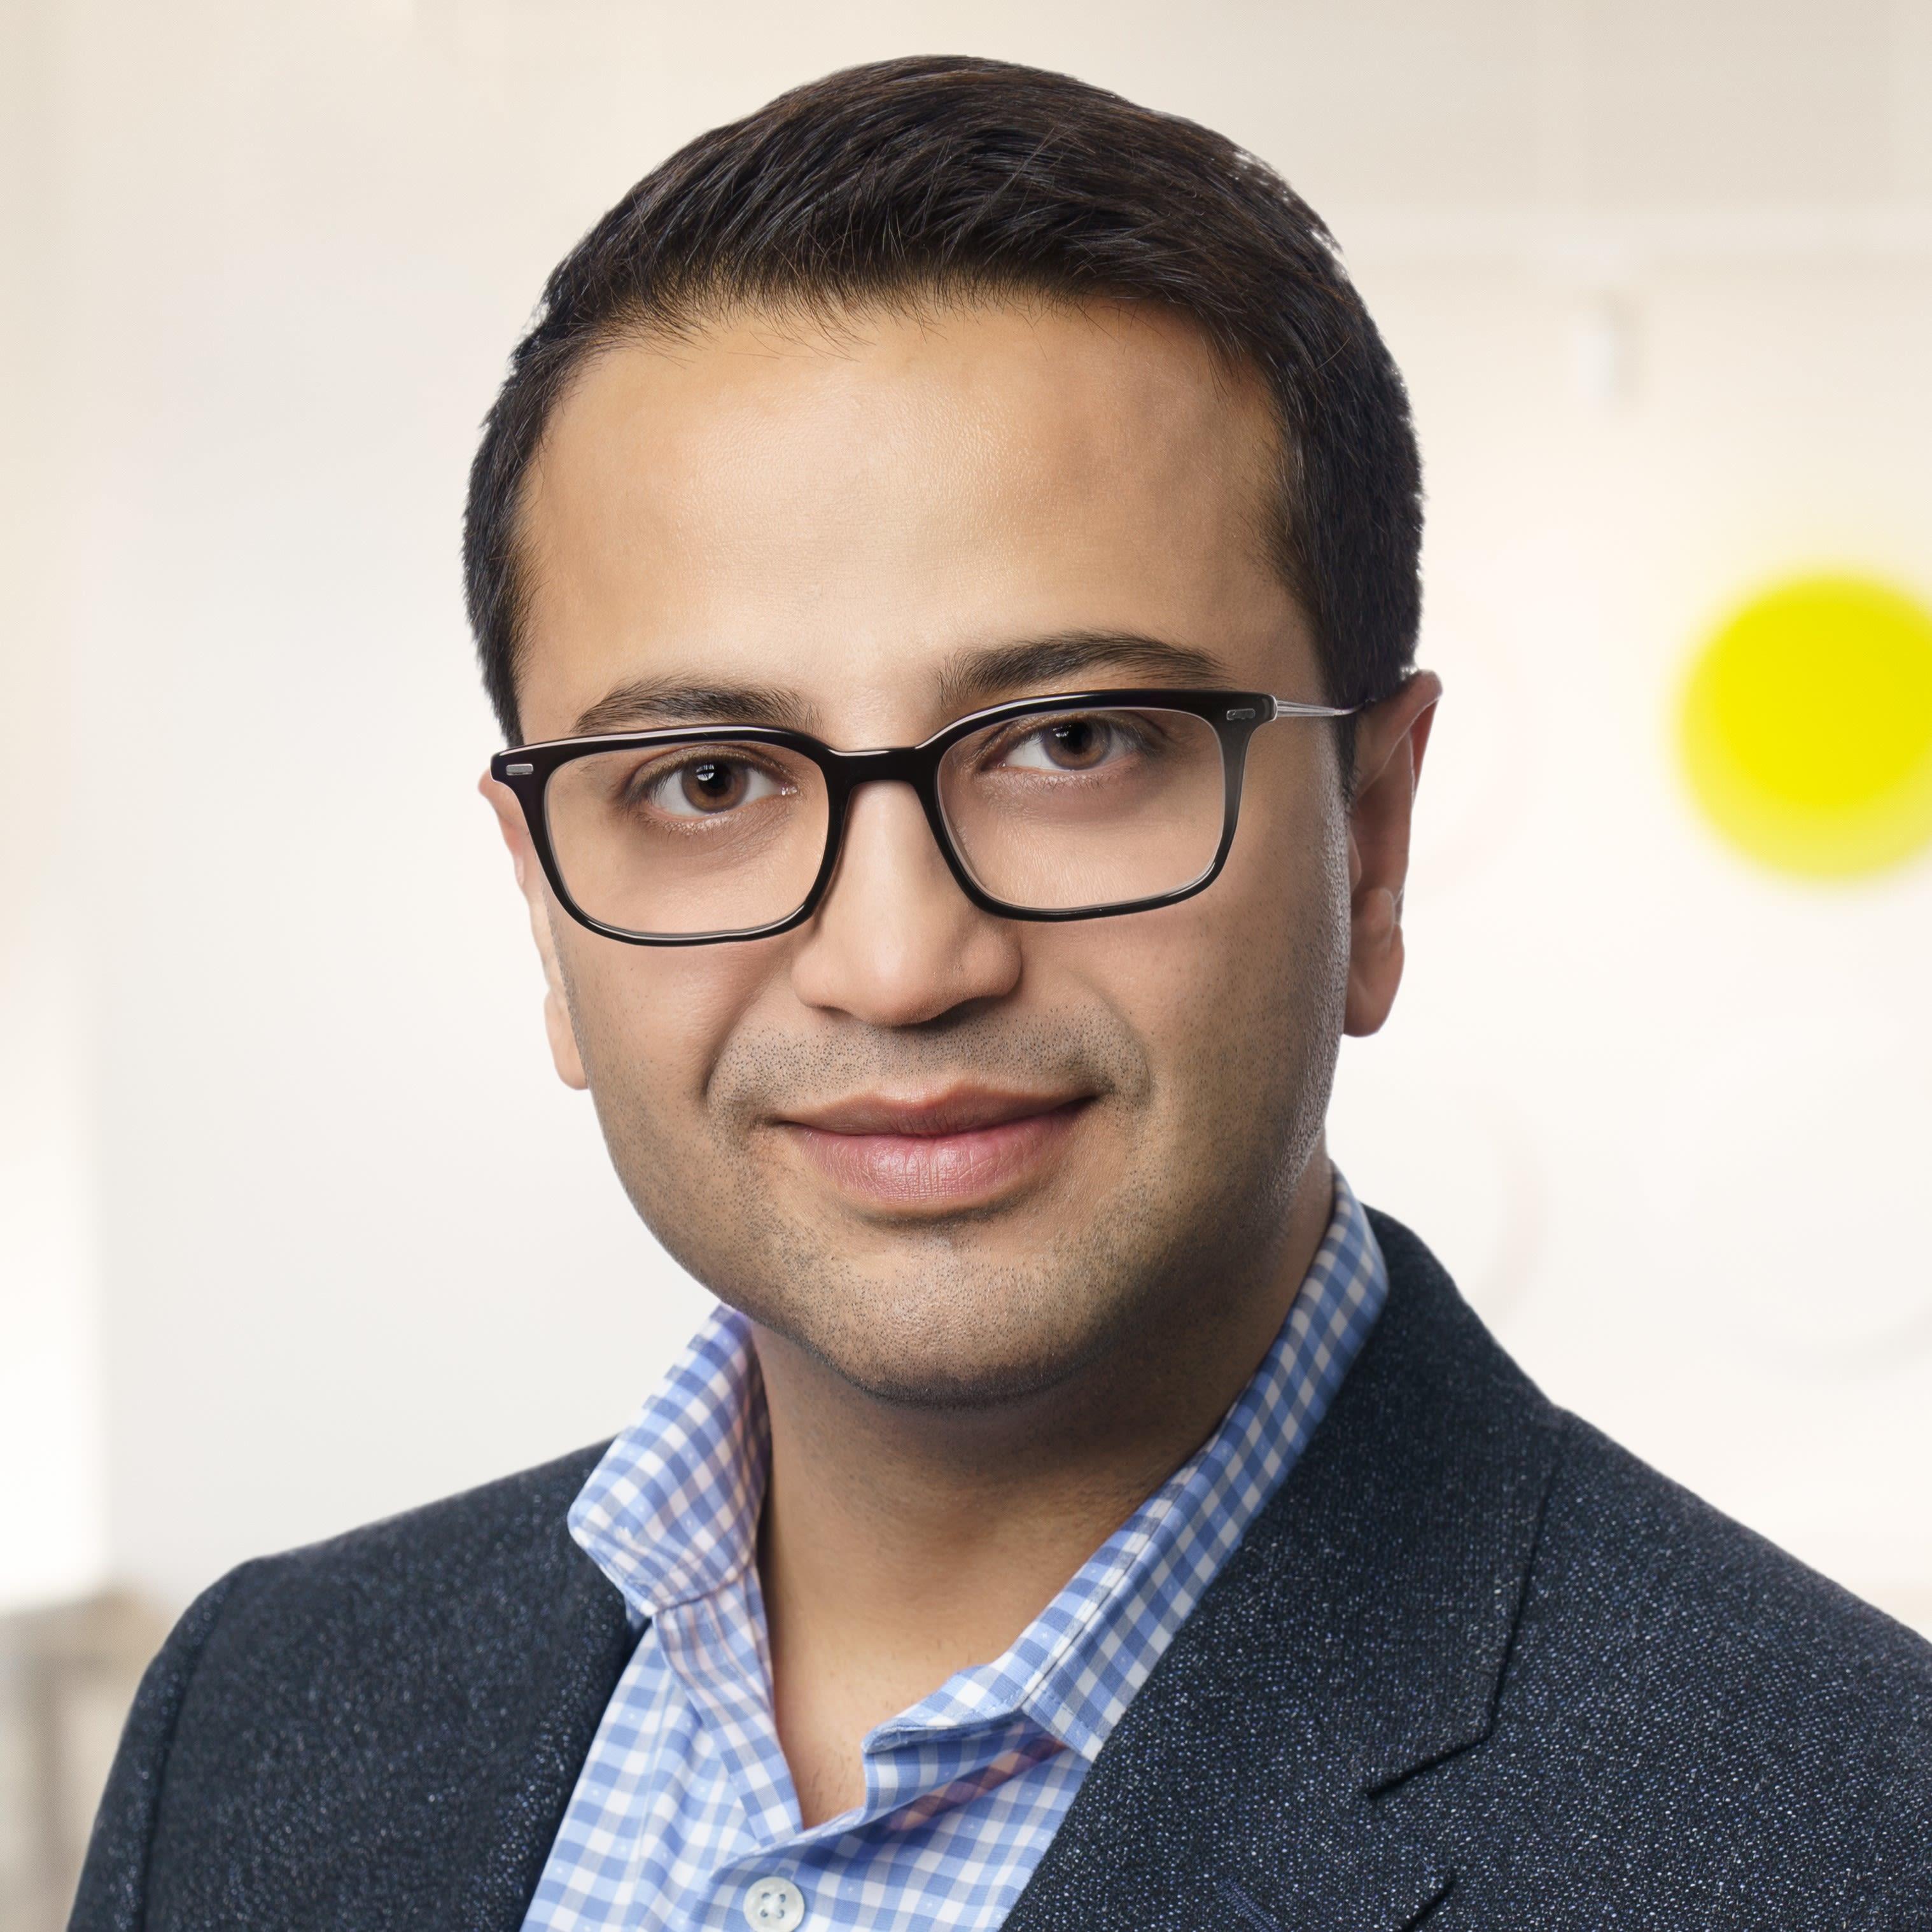 Naveen Bhateja from Medidata Solutions